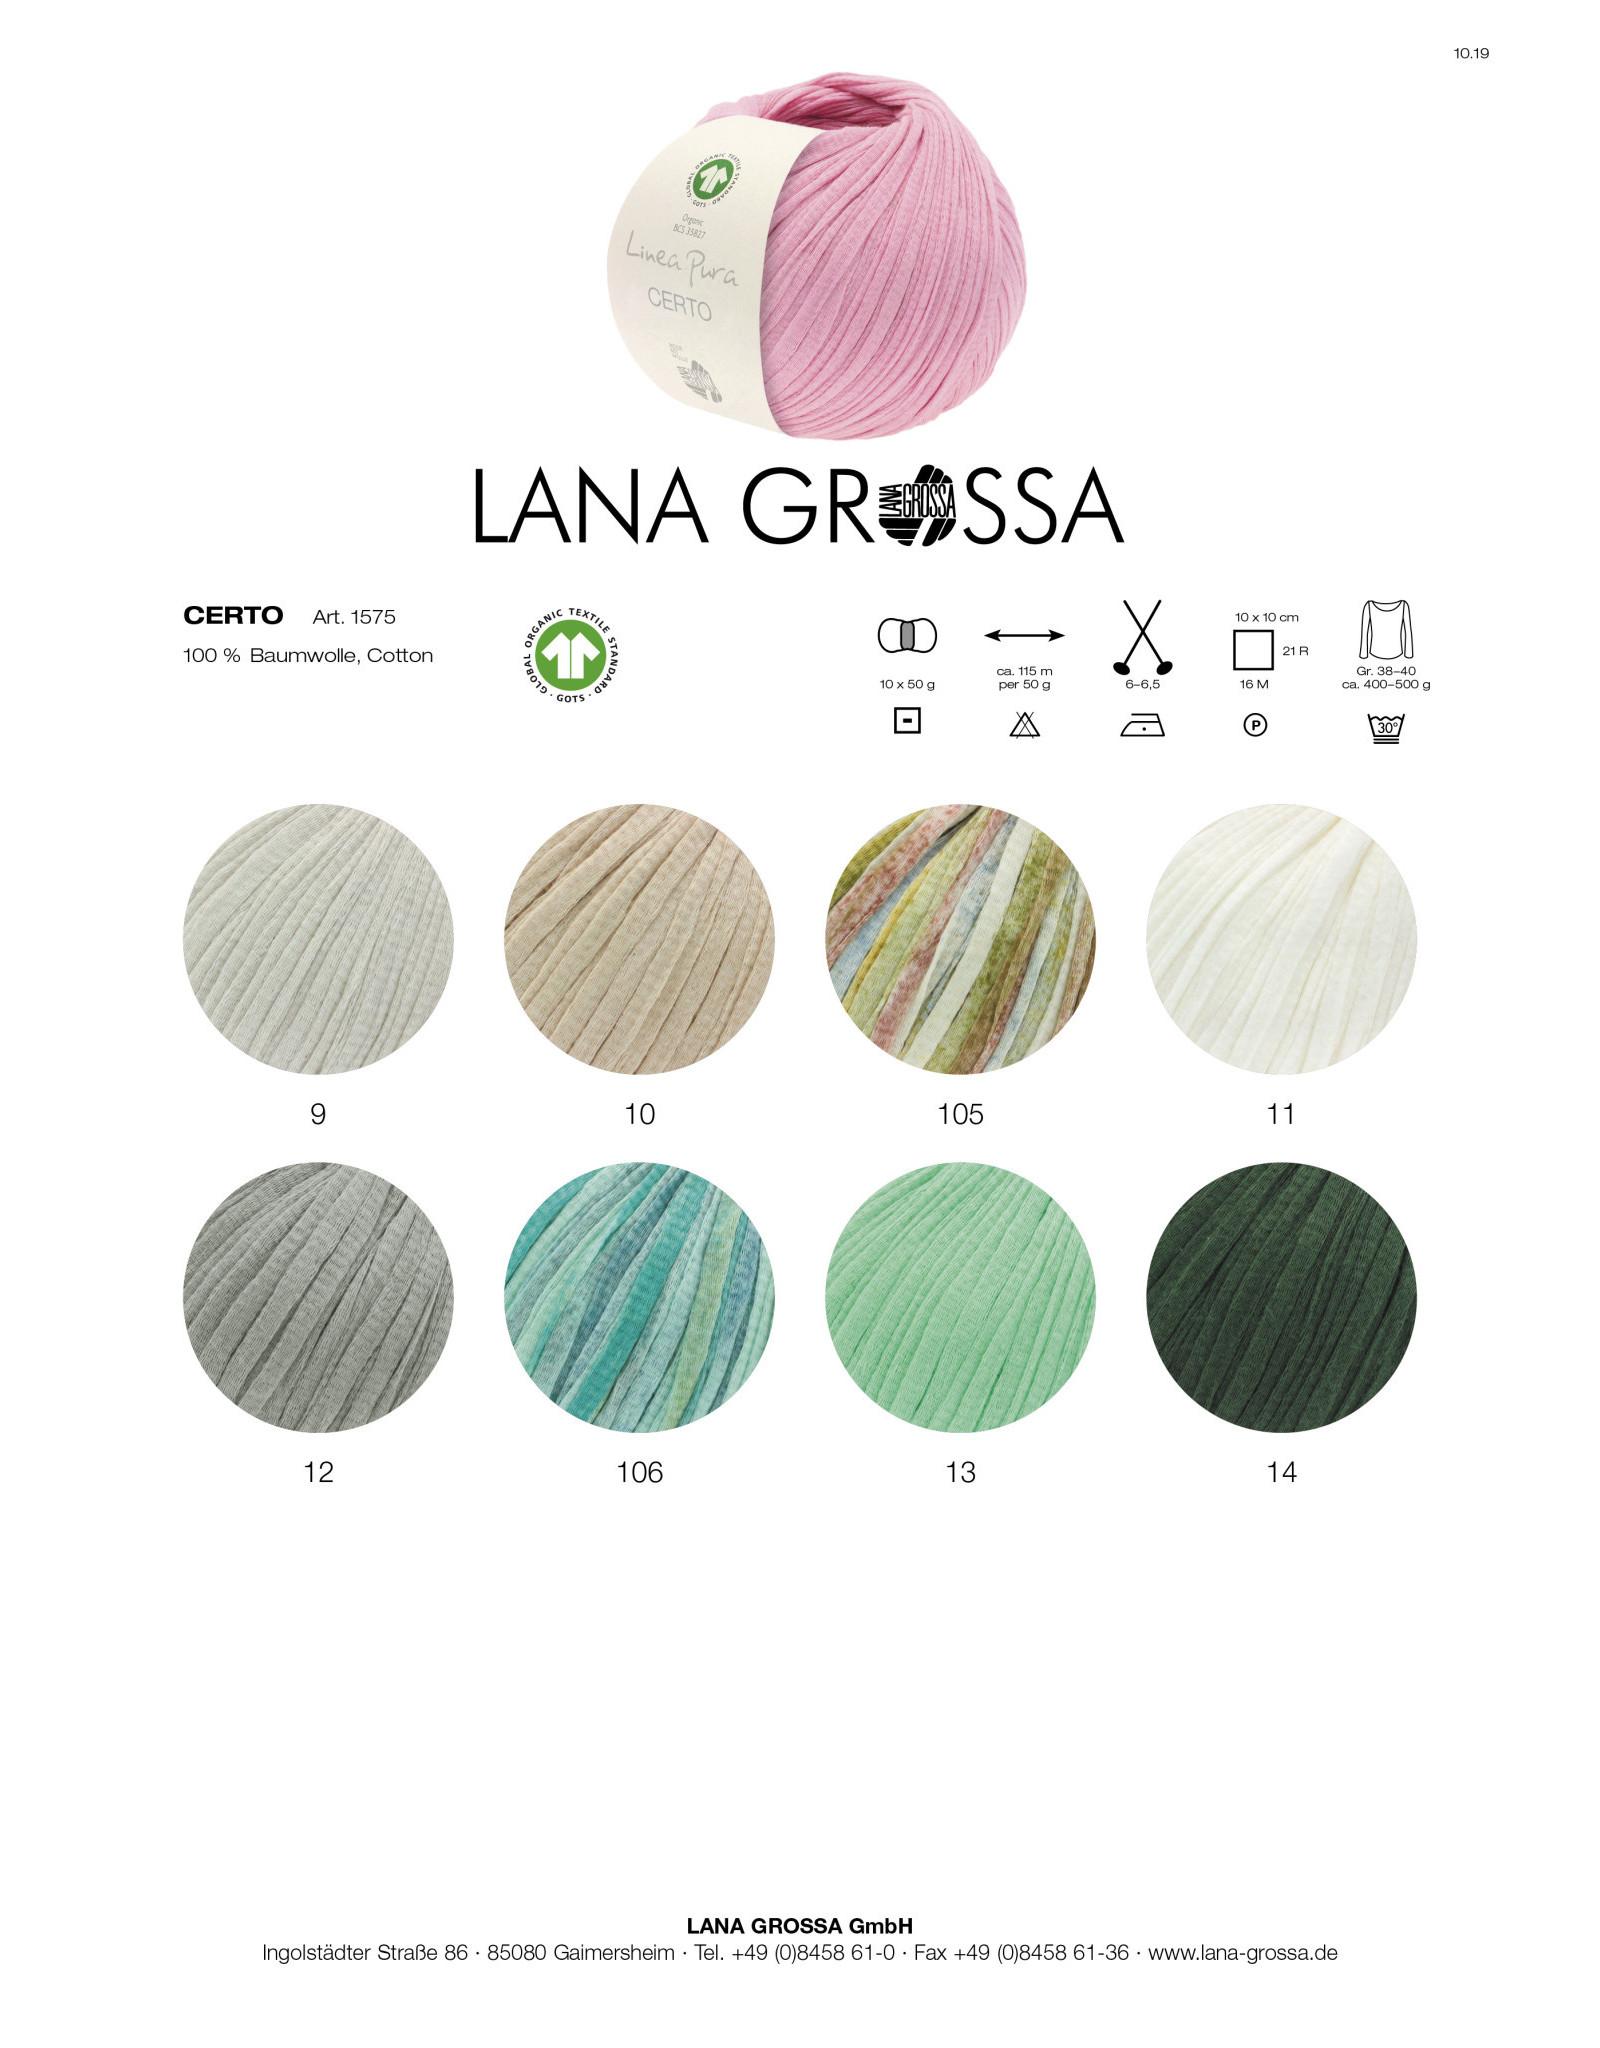 Lana Grossa Linea Pura Certo Print GOTS - 115 m - 50 g